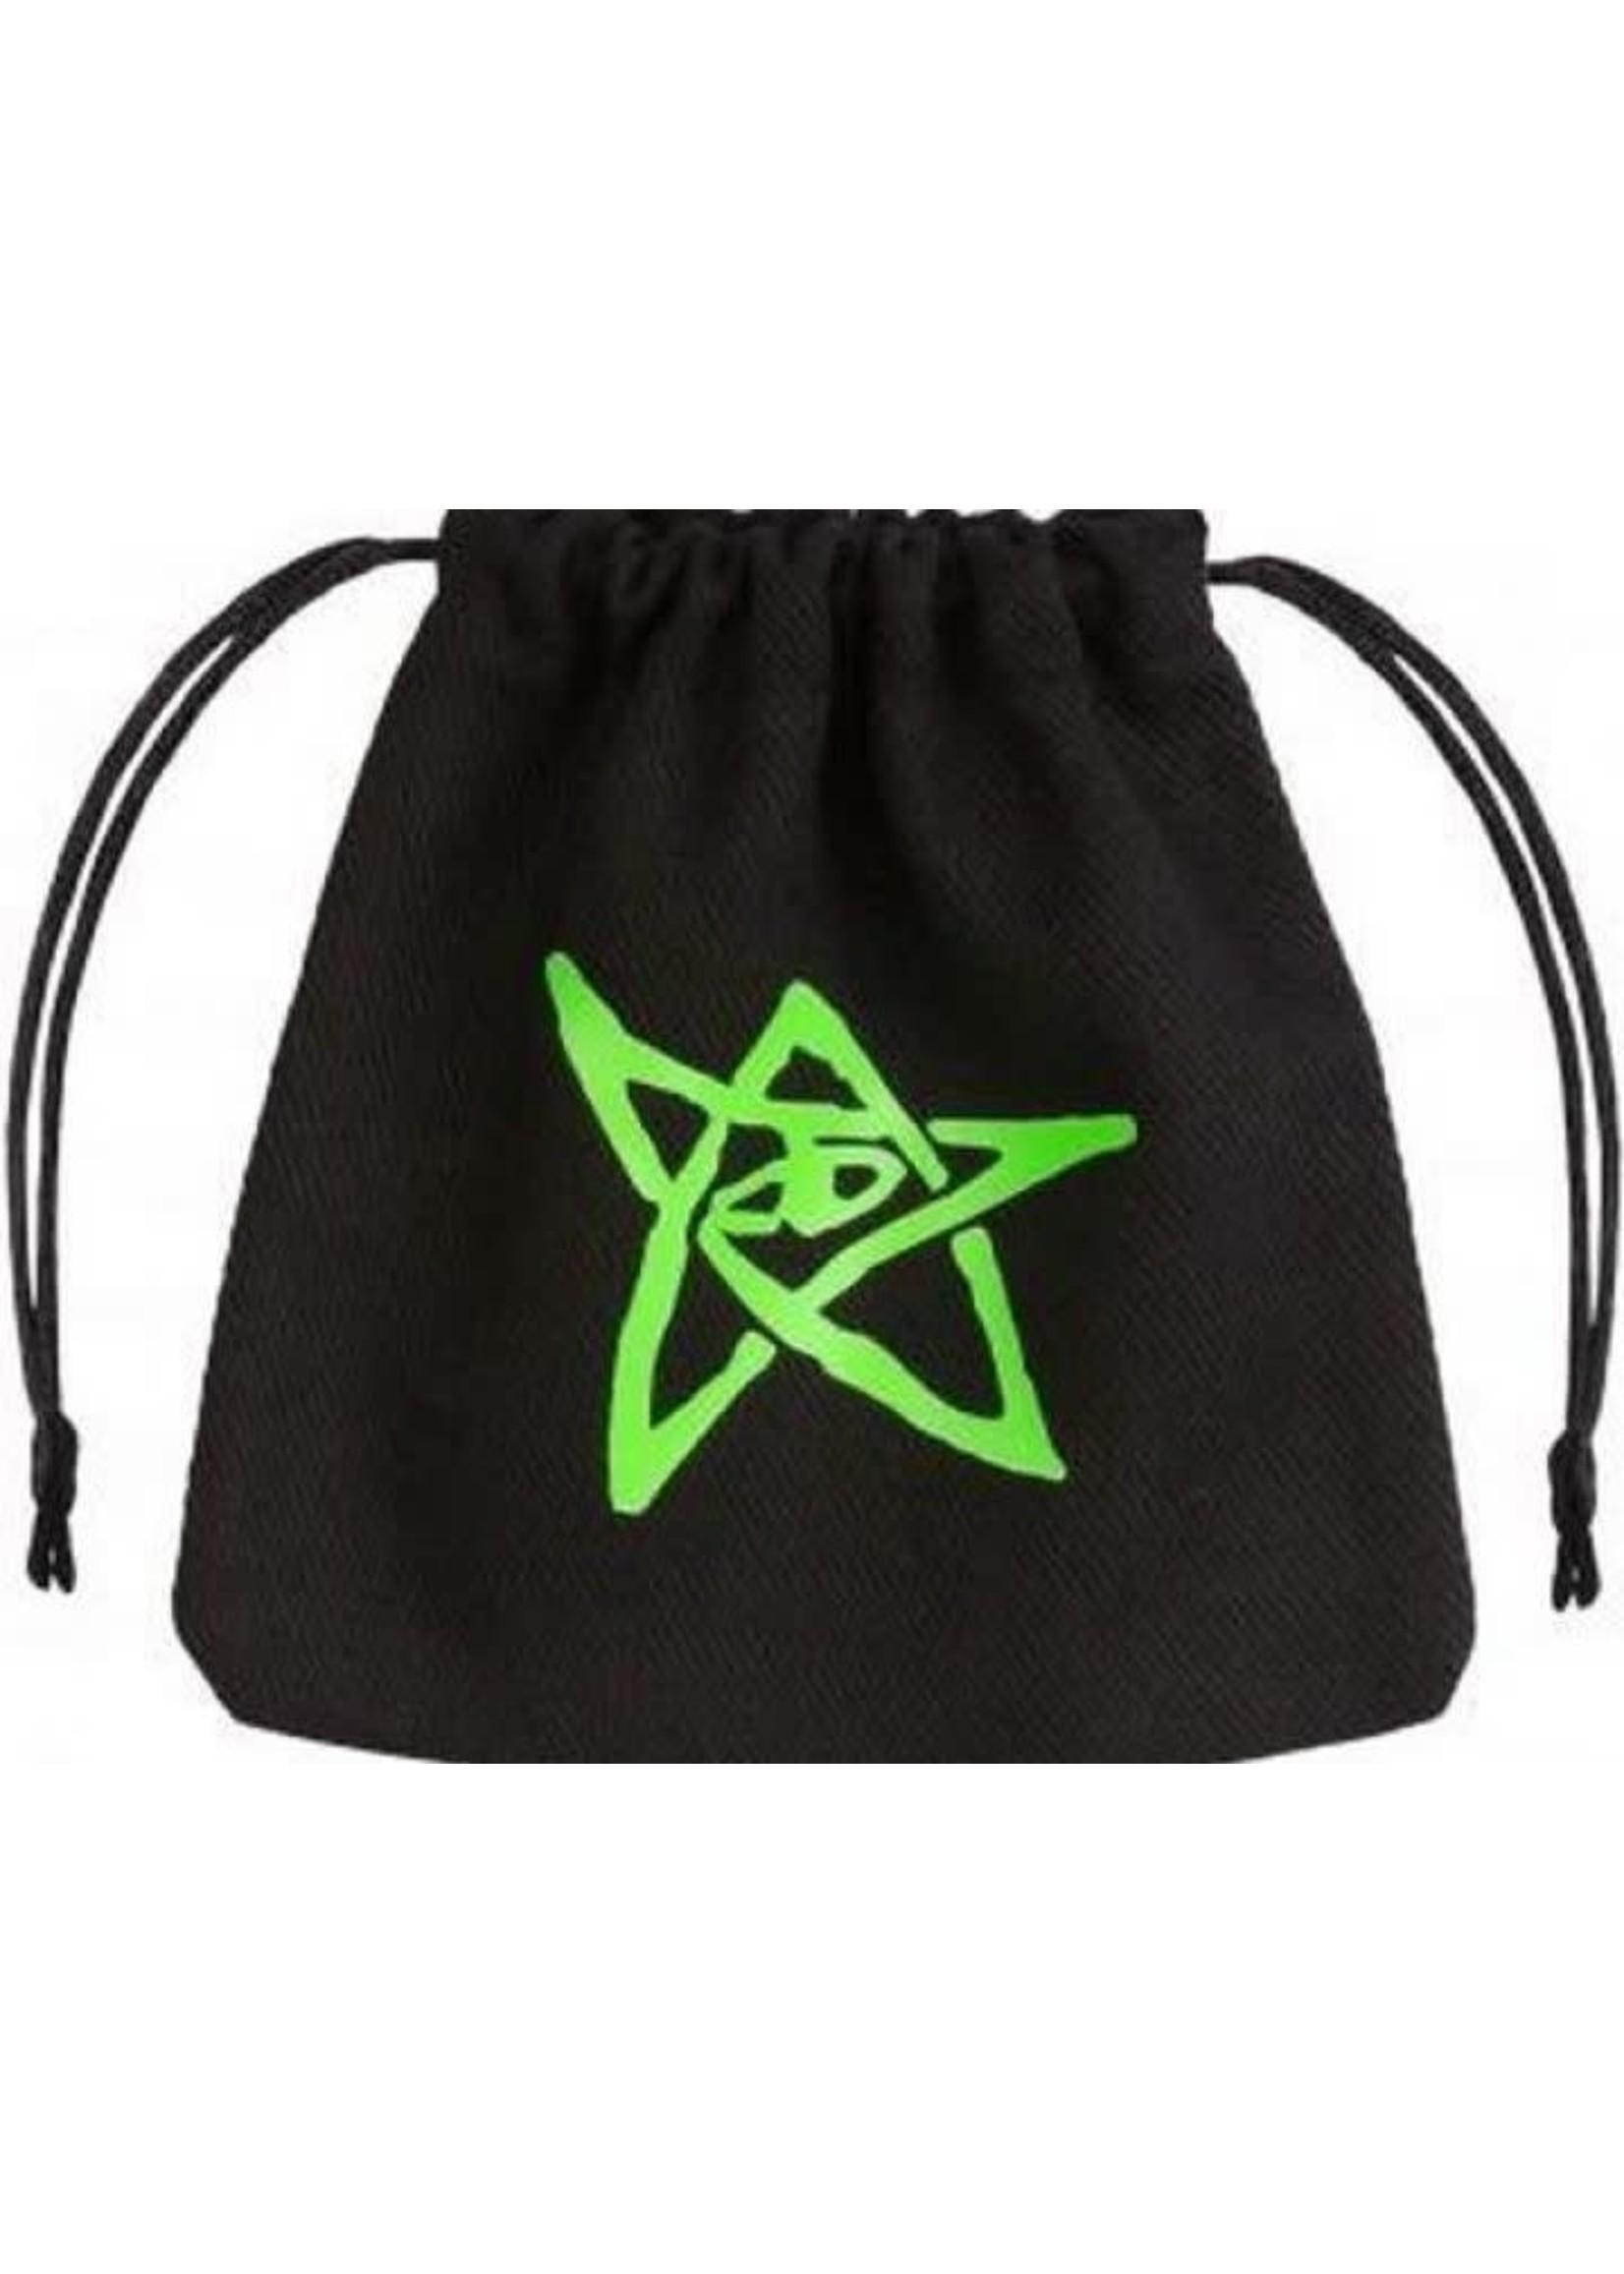 Dice Bag Ctulhu Black & Green